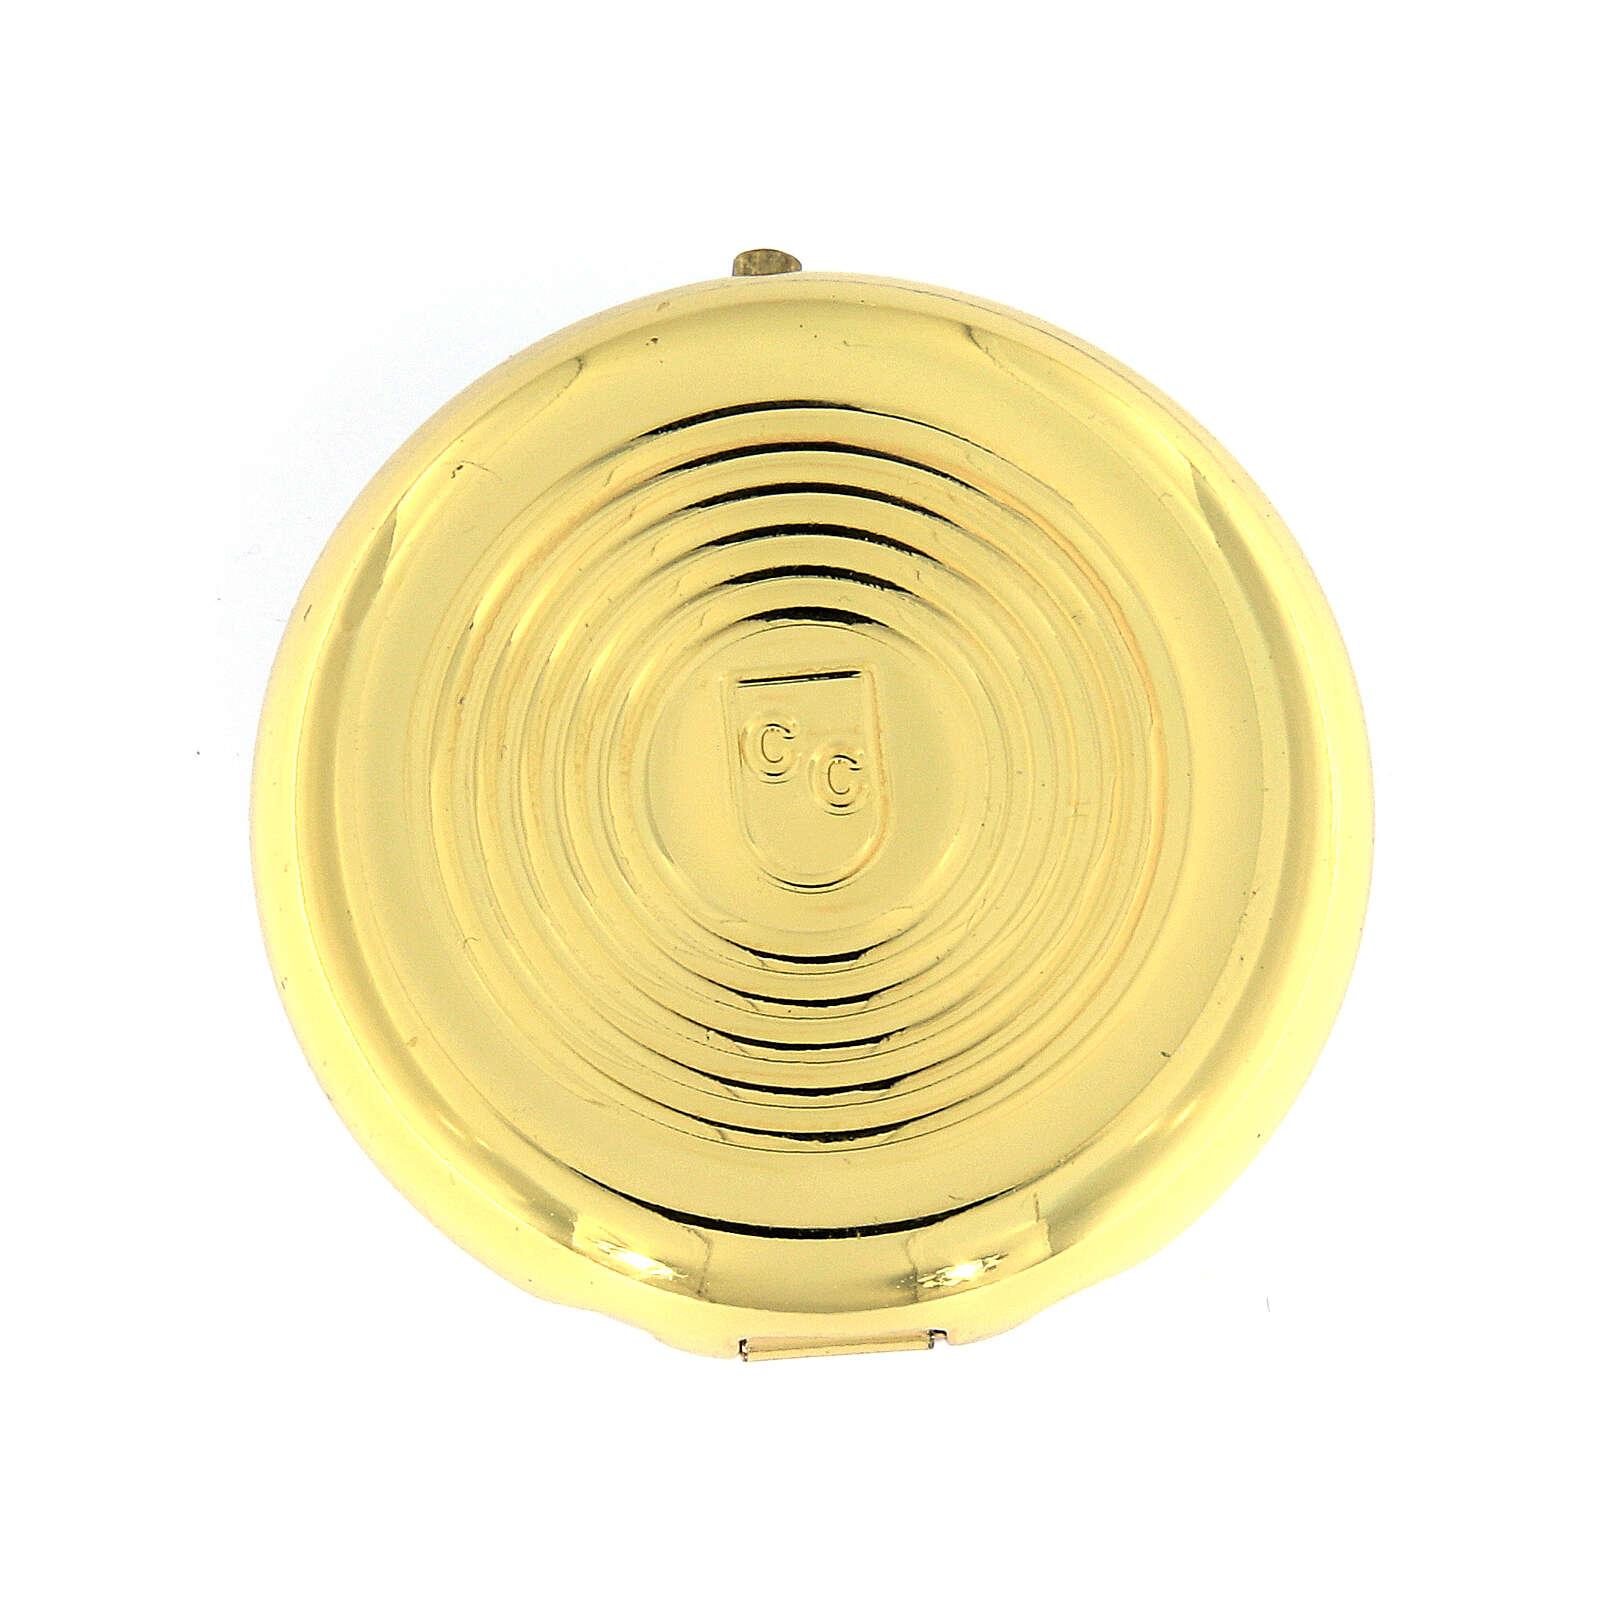 Teca para hostias JHS metal plancha aluminio detalles oro 5 cm 3